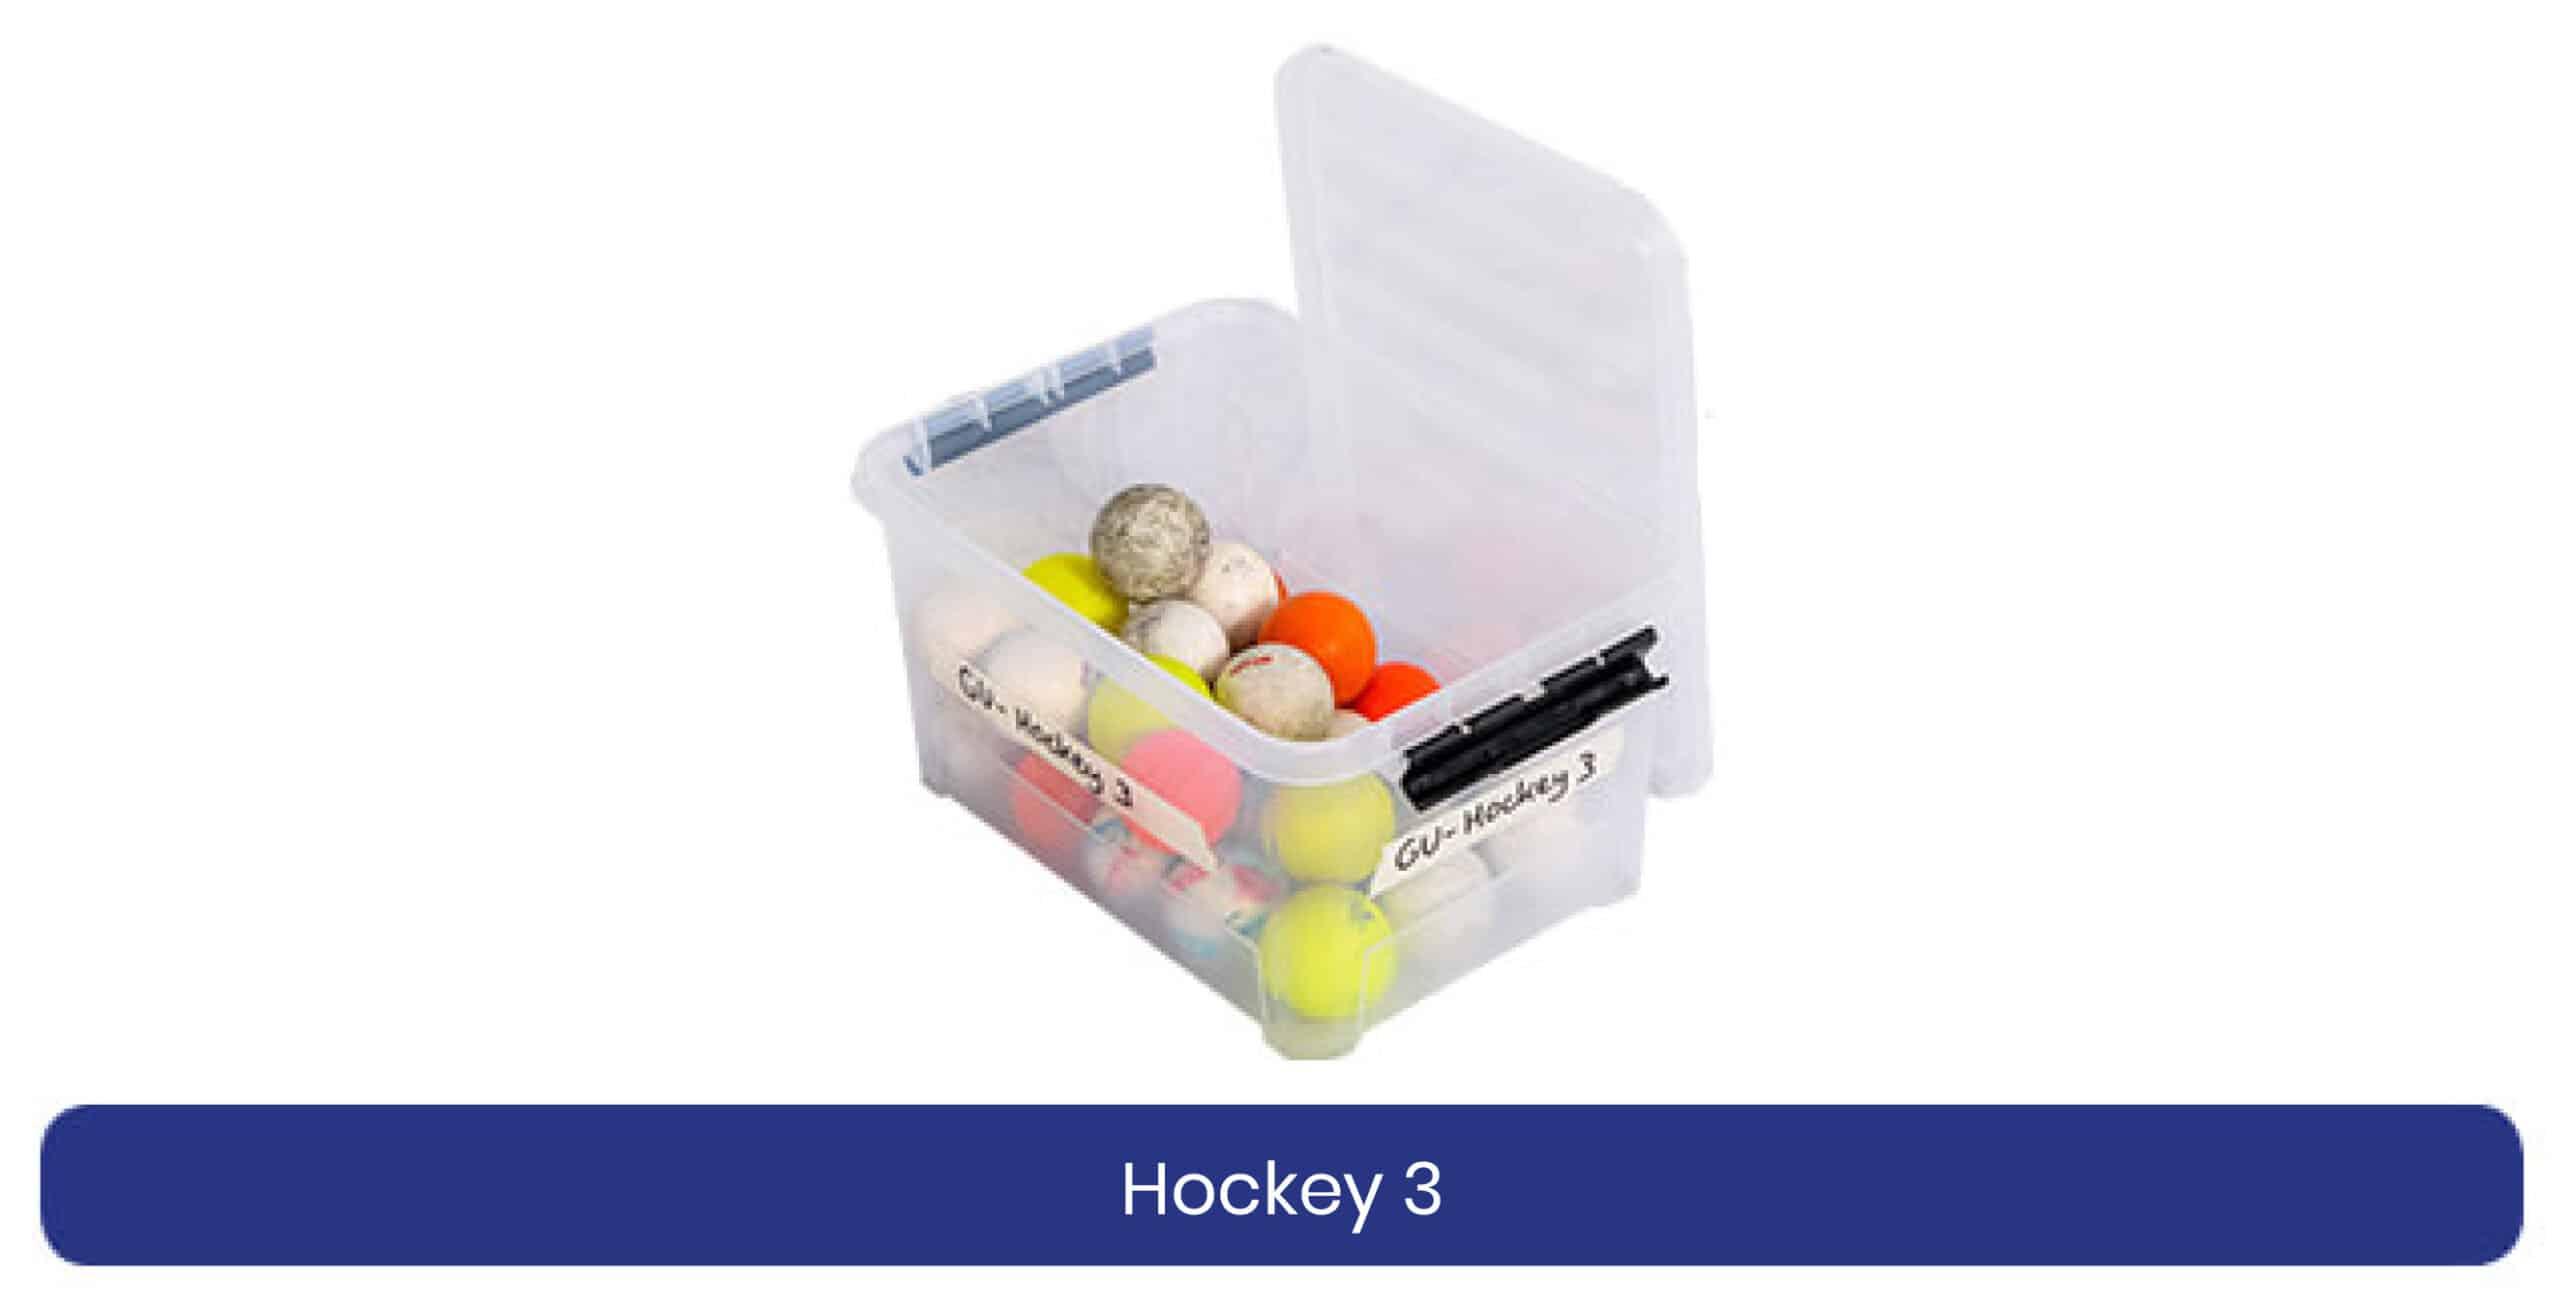 Hockey 3 lenen product